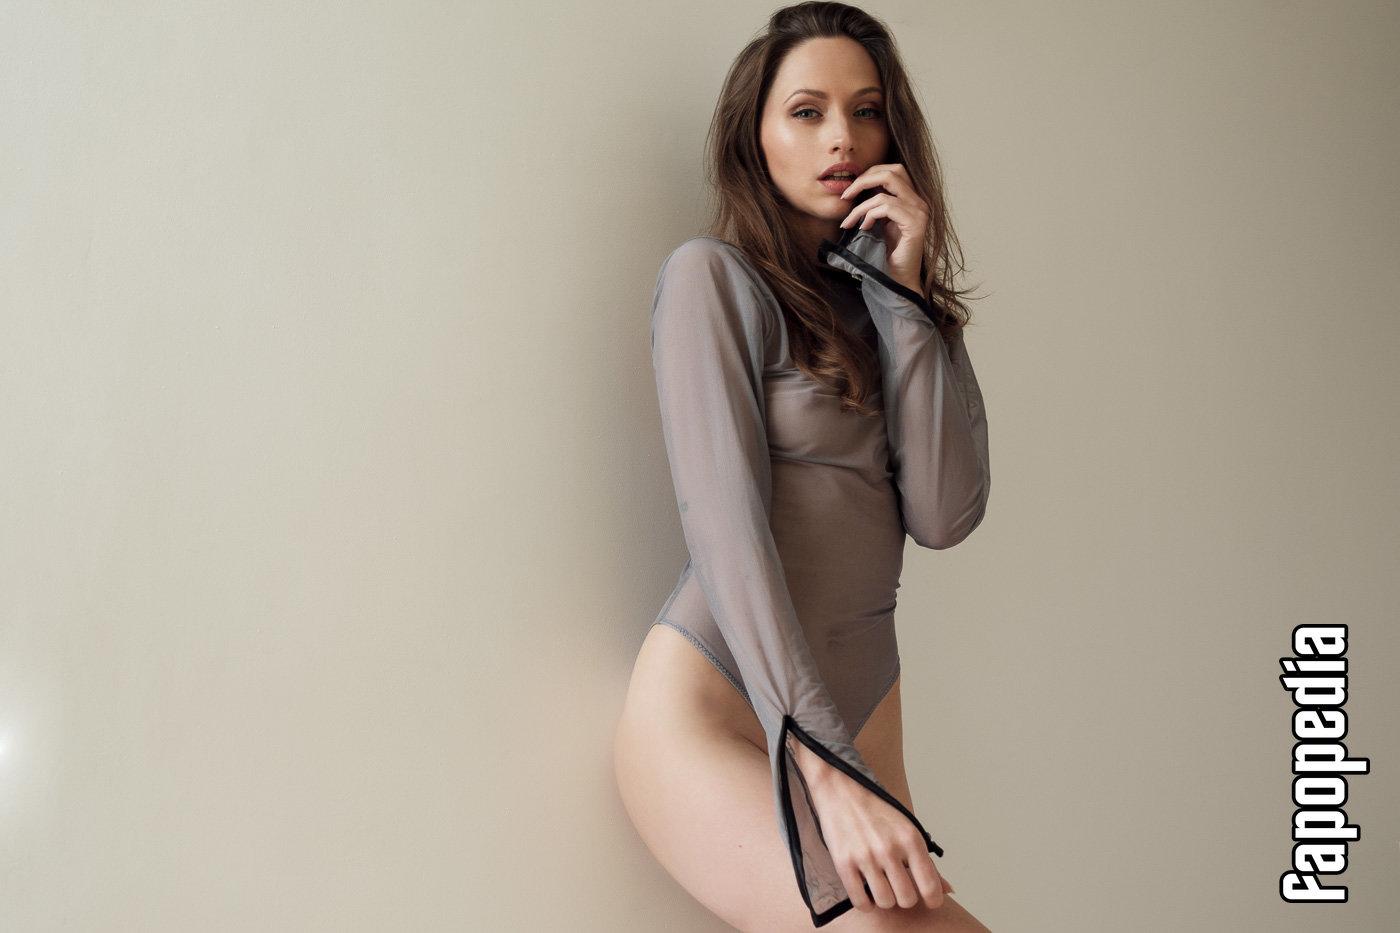 Laura Bgn Nude Patreon Leaks